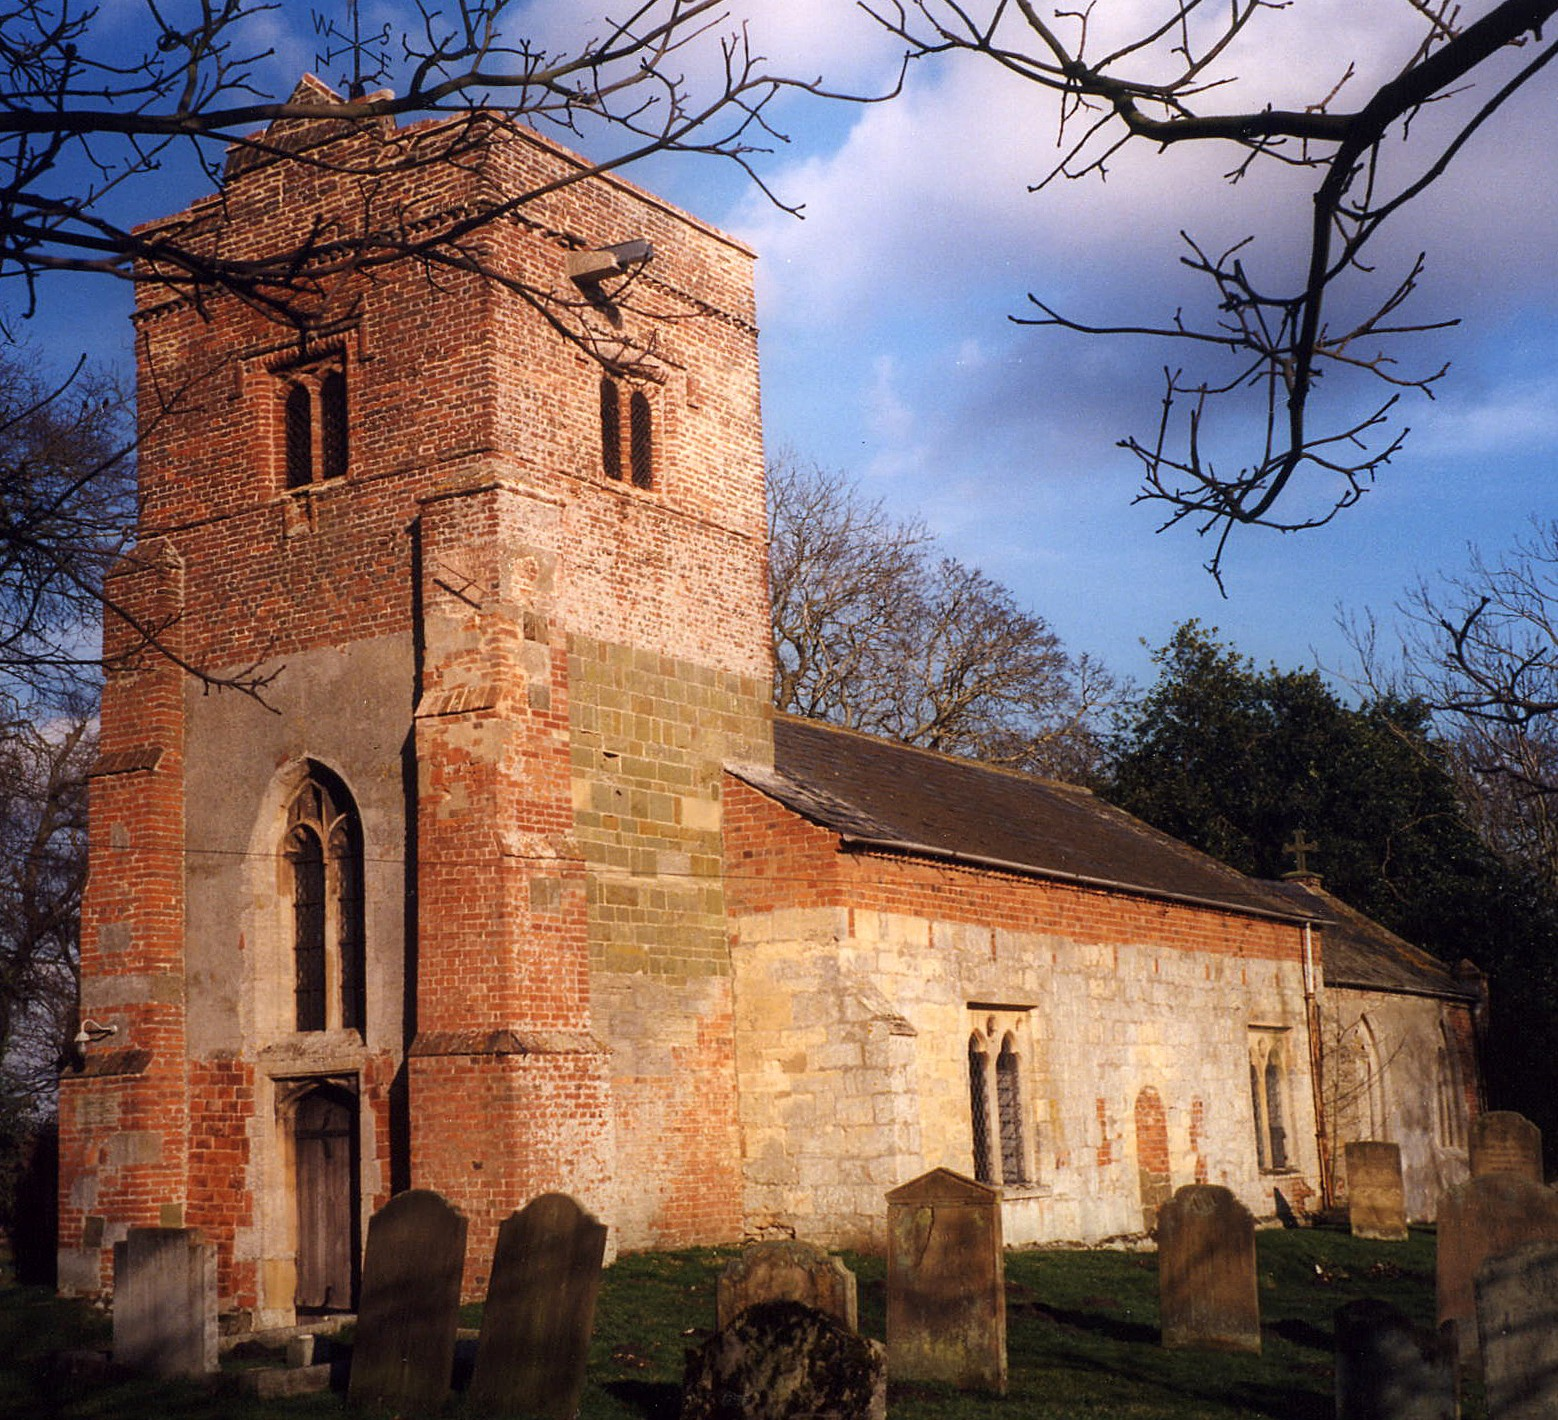 Saint Margaret's Church